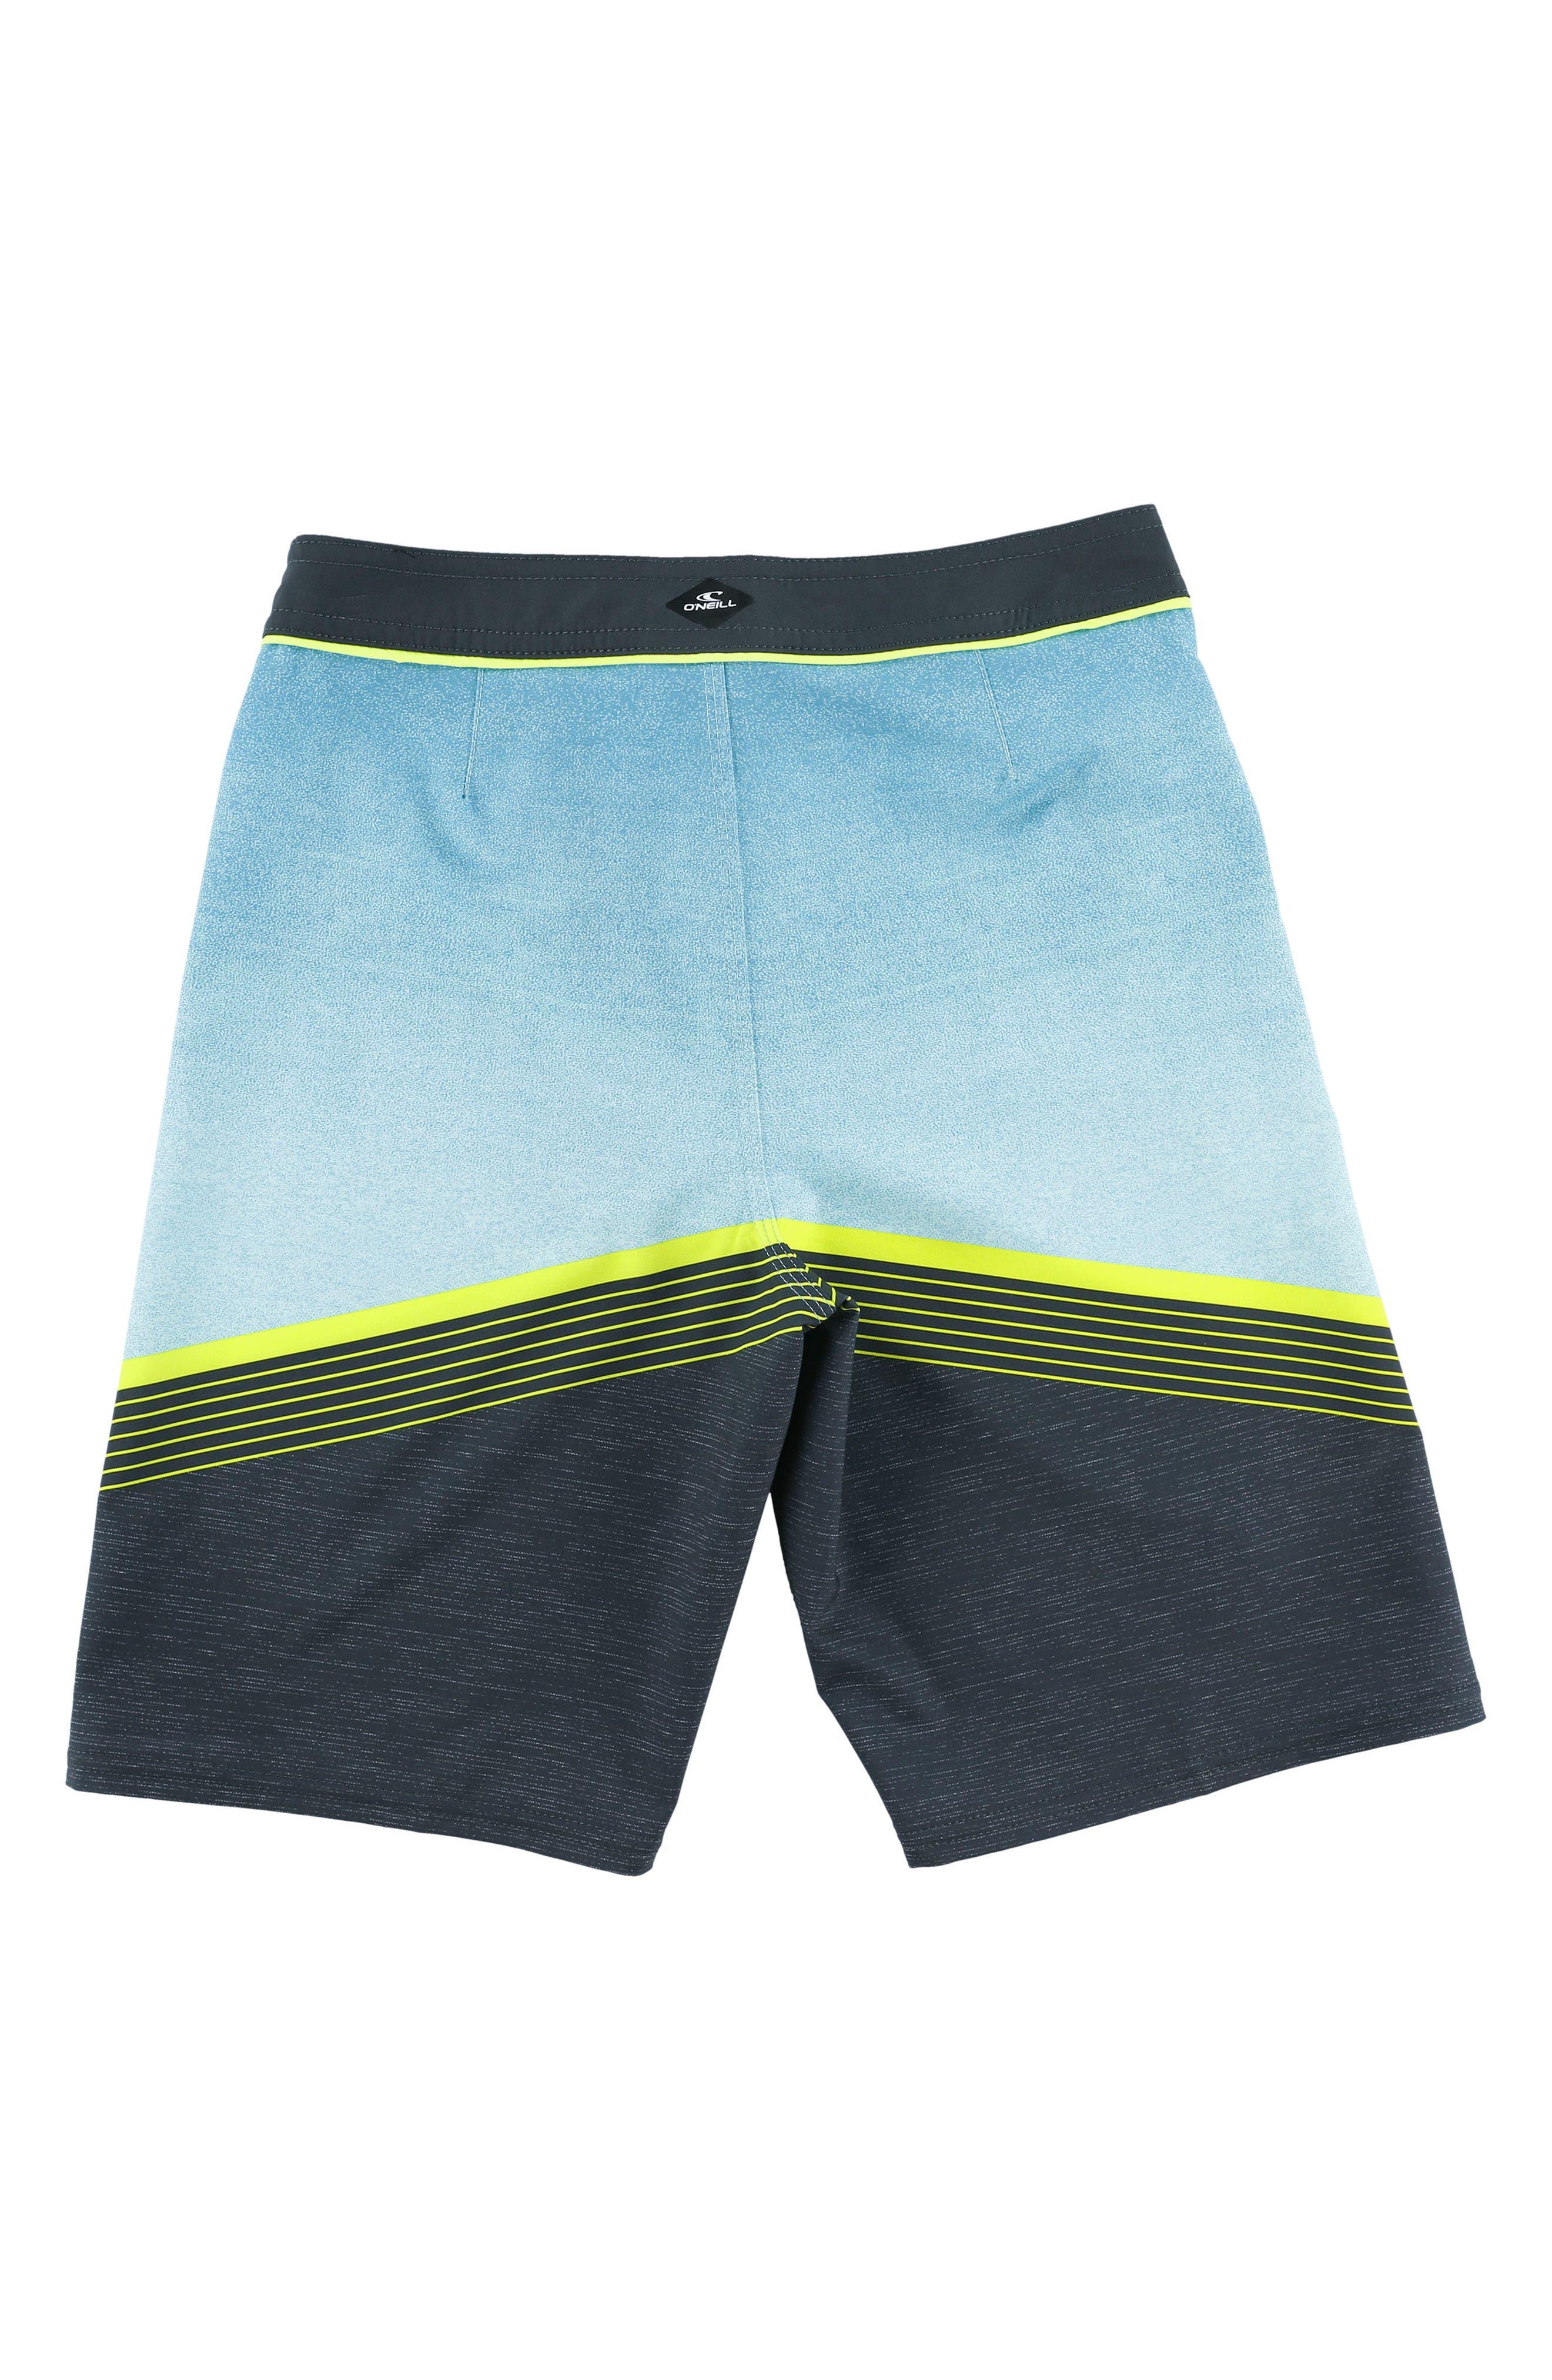 Hyperfreak Stretch Board Shorts,                             Alternate thumbnail 14, color,